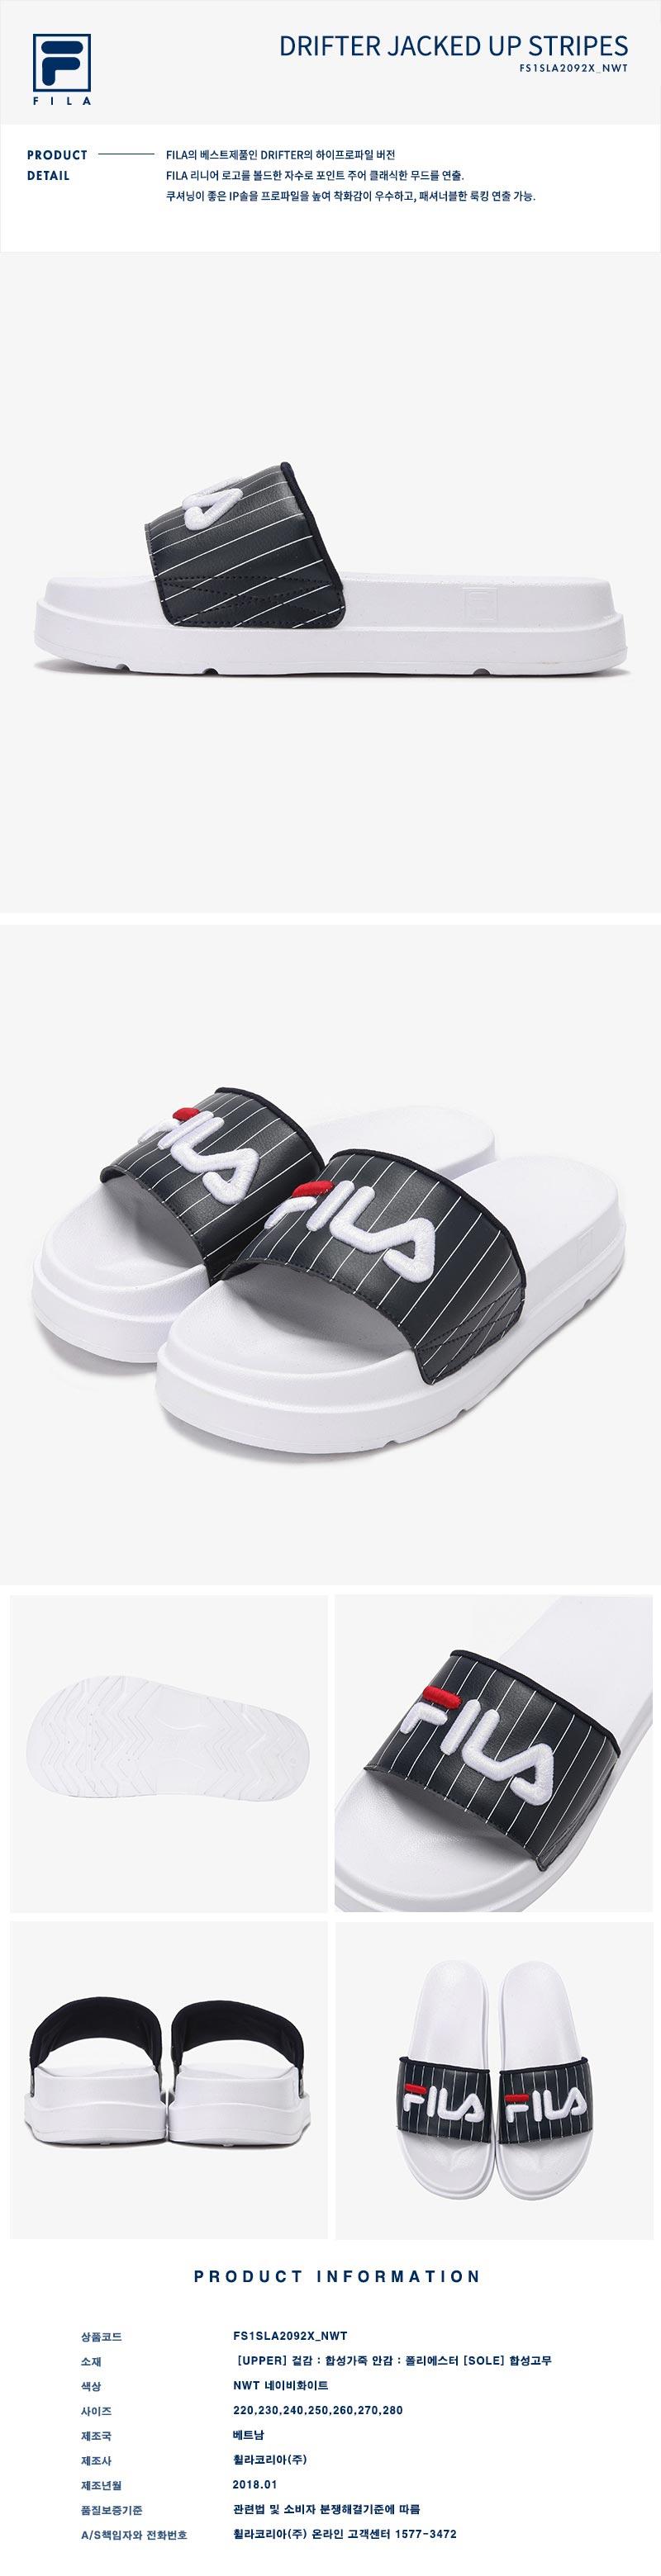 8aa68c4f8b01  FILA  Couple Sandals Slipper Drifter Tapey Jacked Up Stripes   Drifter  Stripes   Fur Sandals